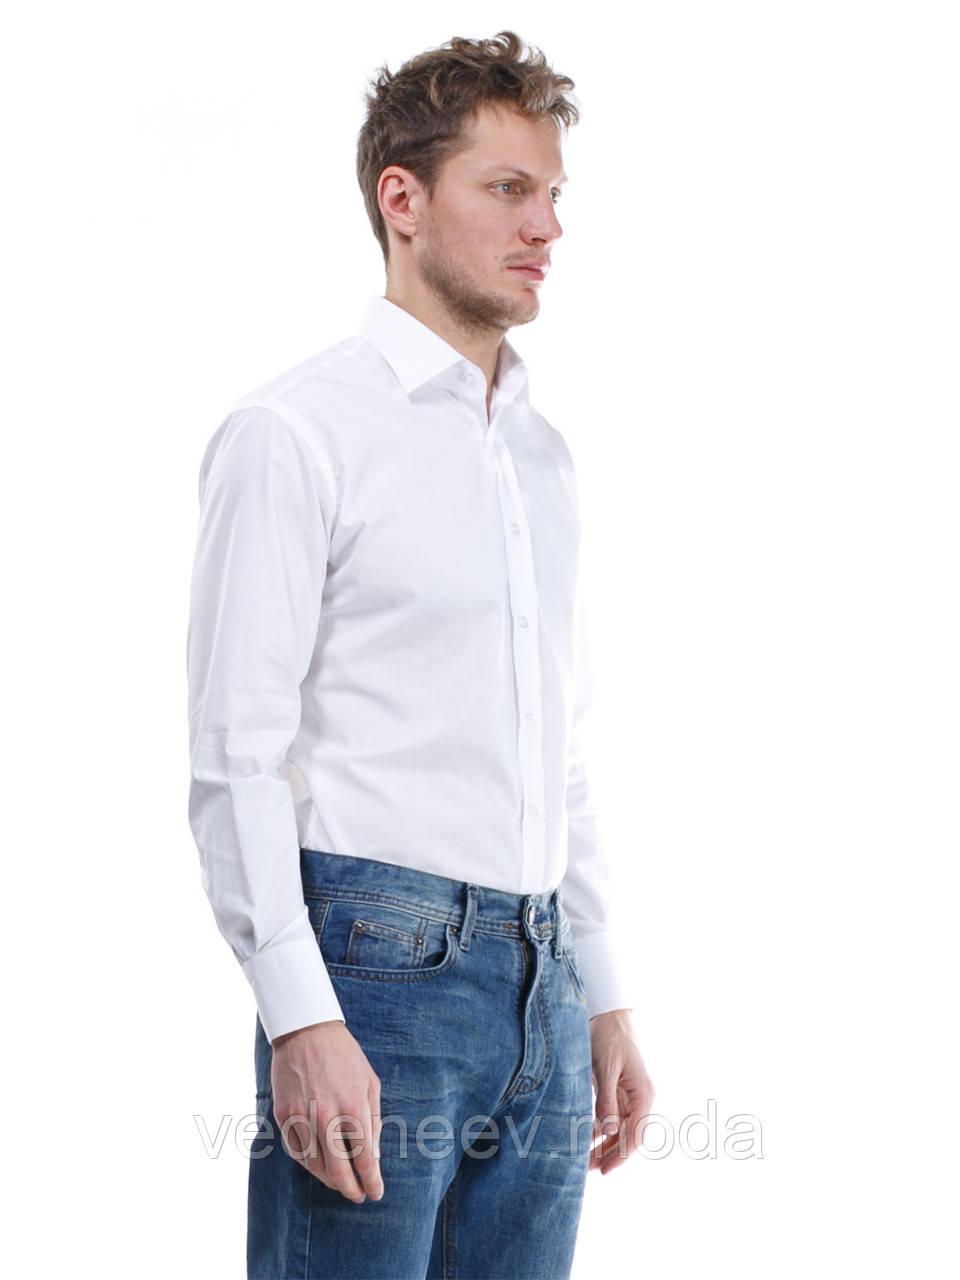 8e72c267be4 Белая приталенная мужская рубашка